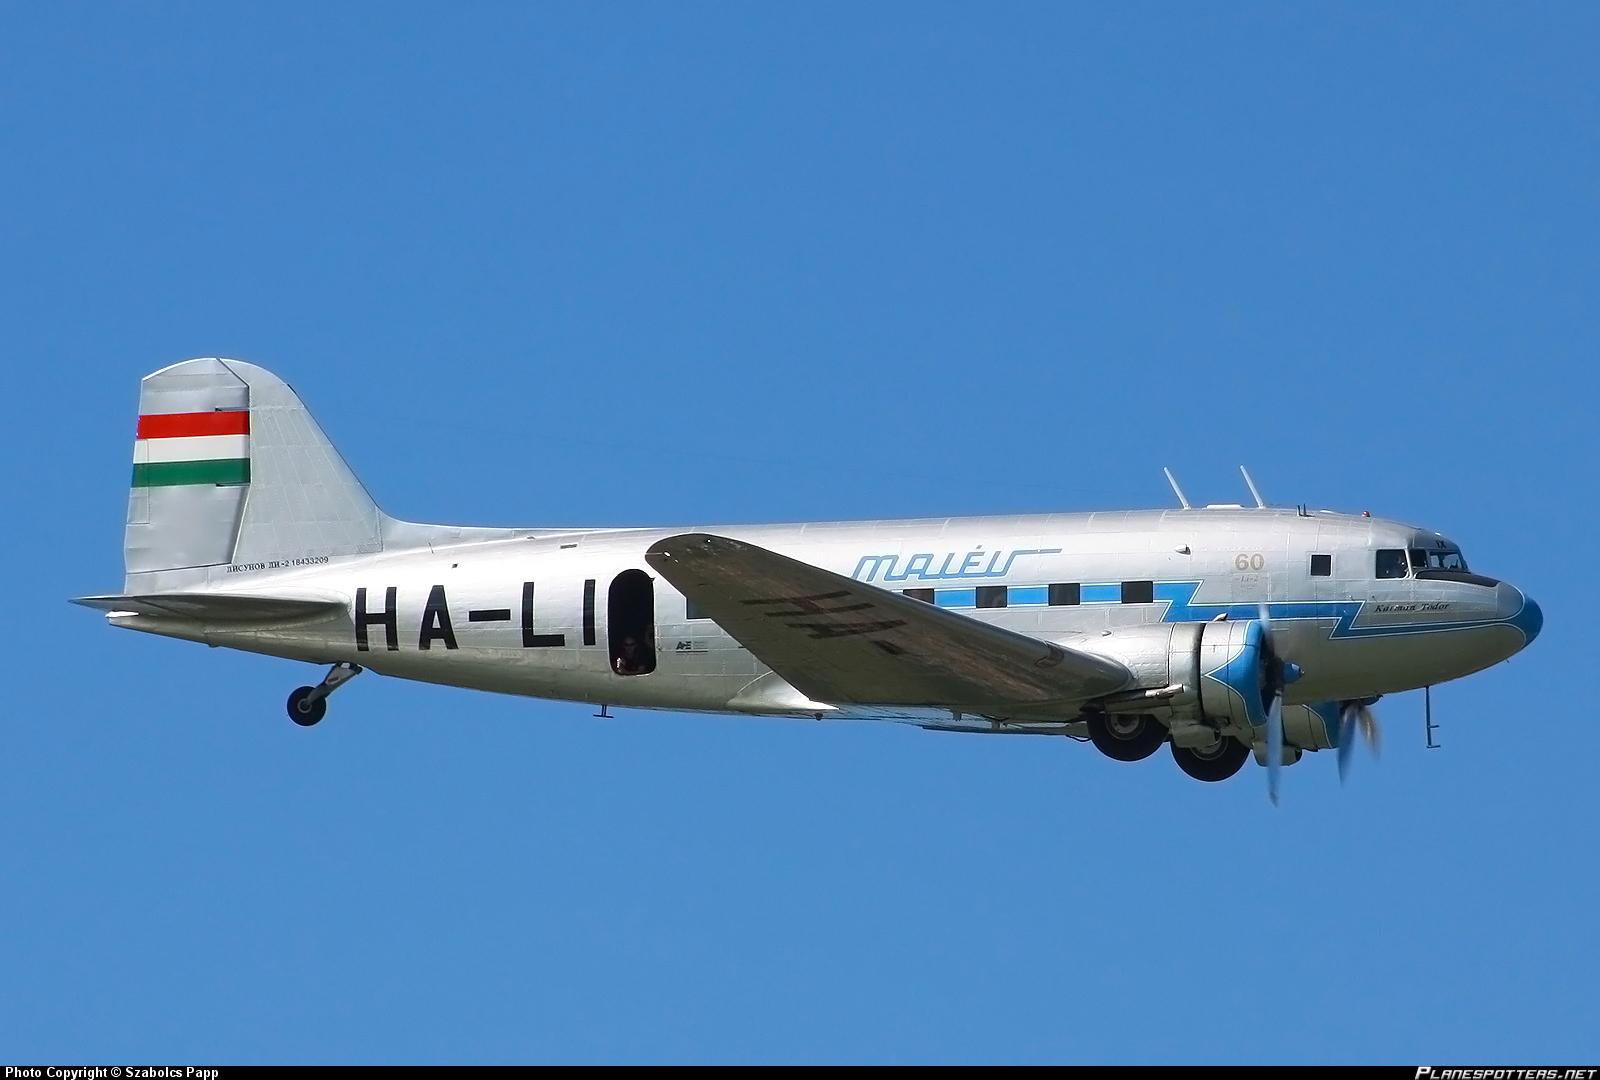 ha-lix-malv-hungarian-airlines-lisunov-li-2t_planespottersnet_303442.jpg